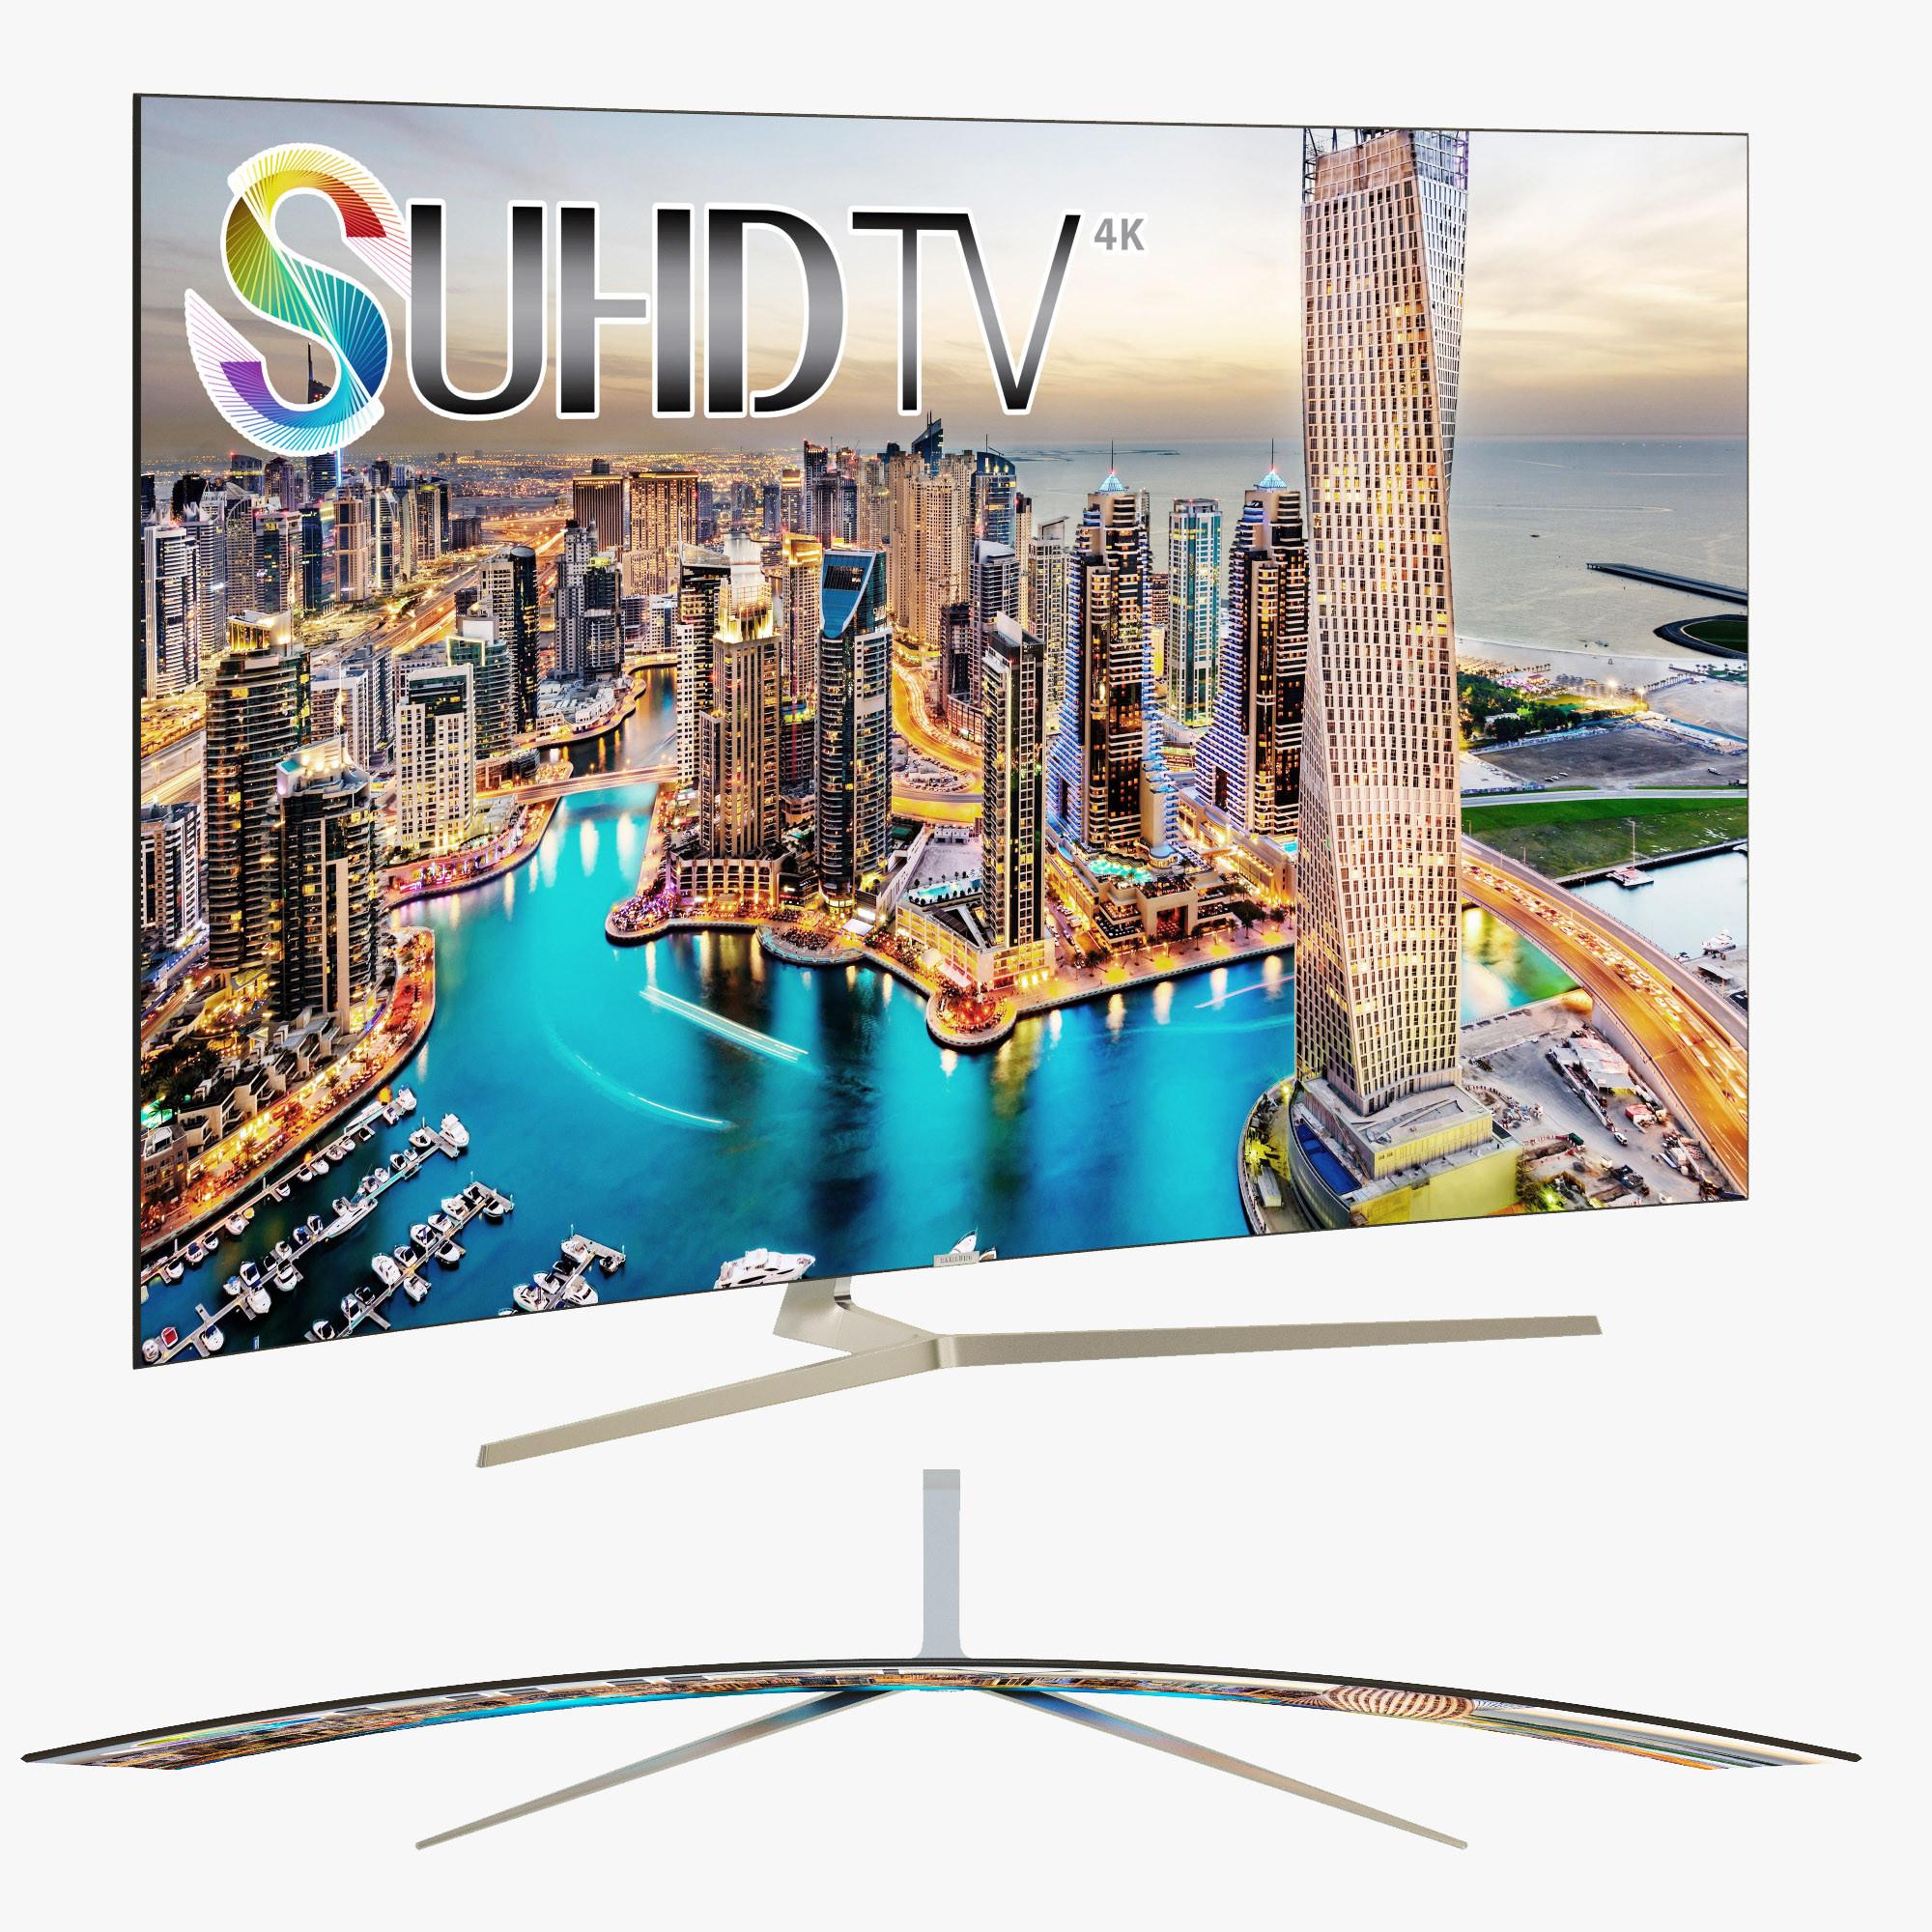 Samsung 78 SUHD 4K Curved Smart TV KS9000 Series 92aaa.jpg